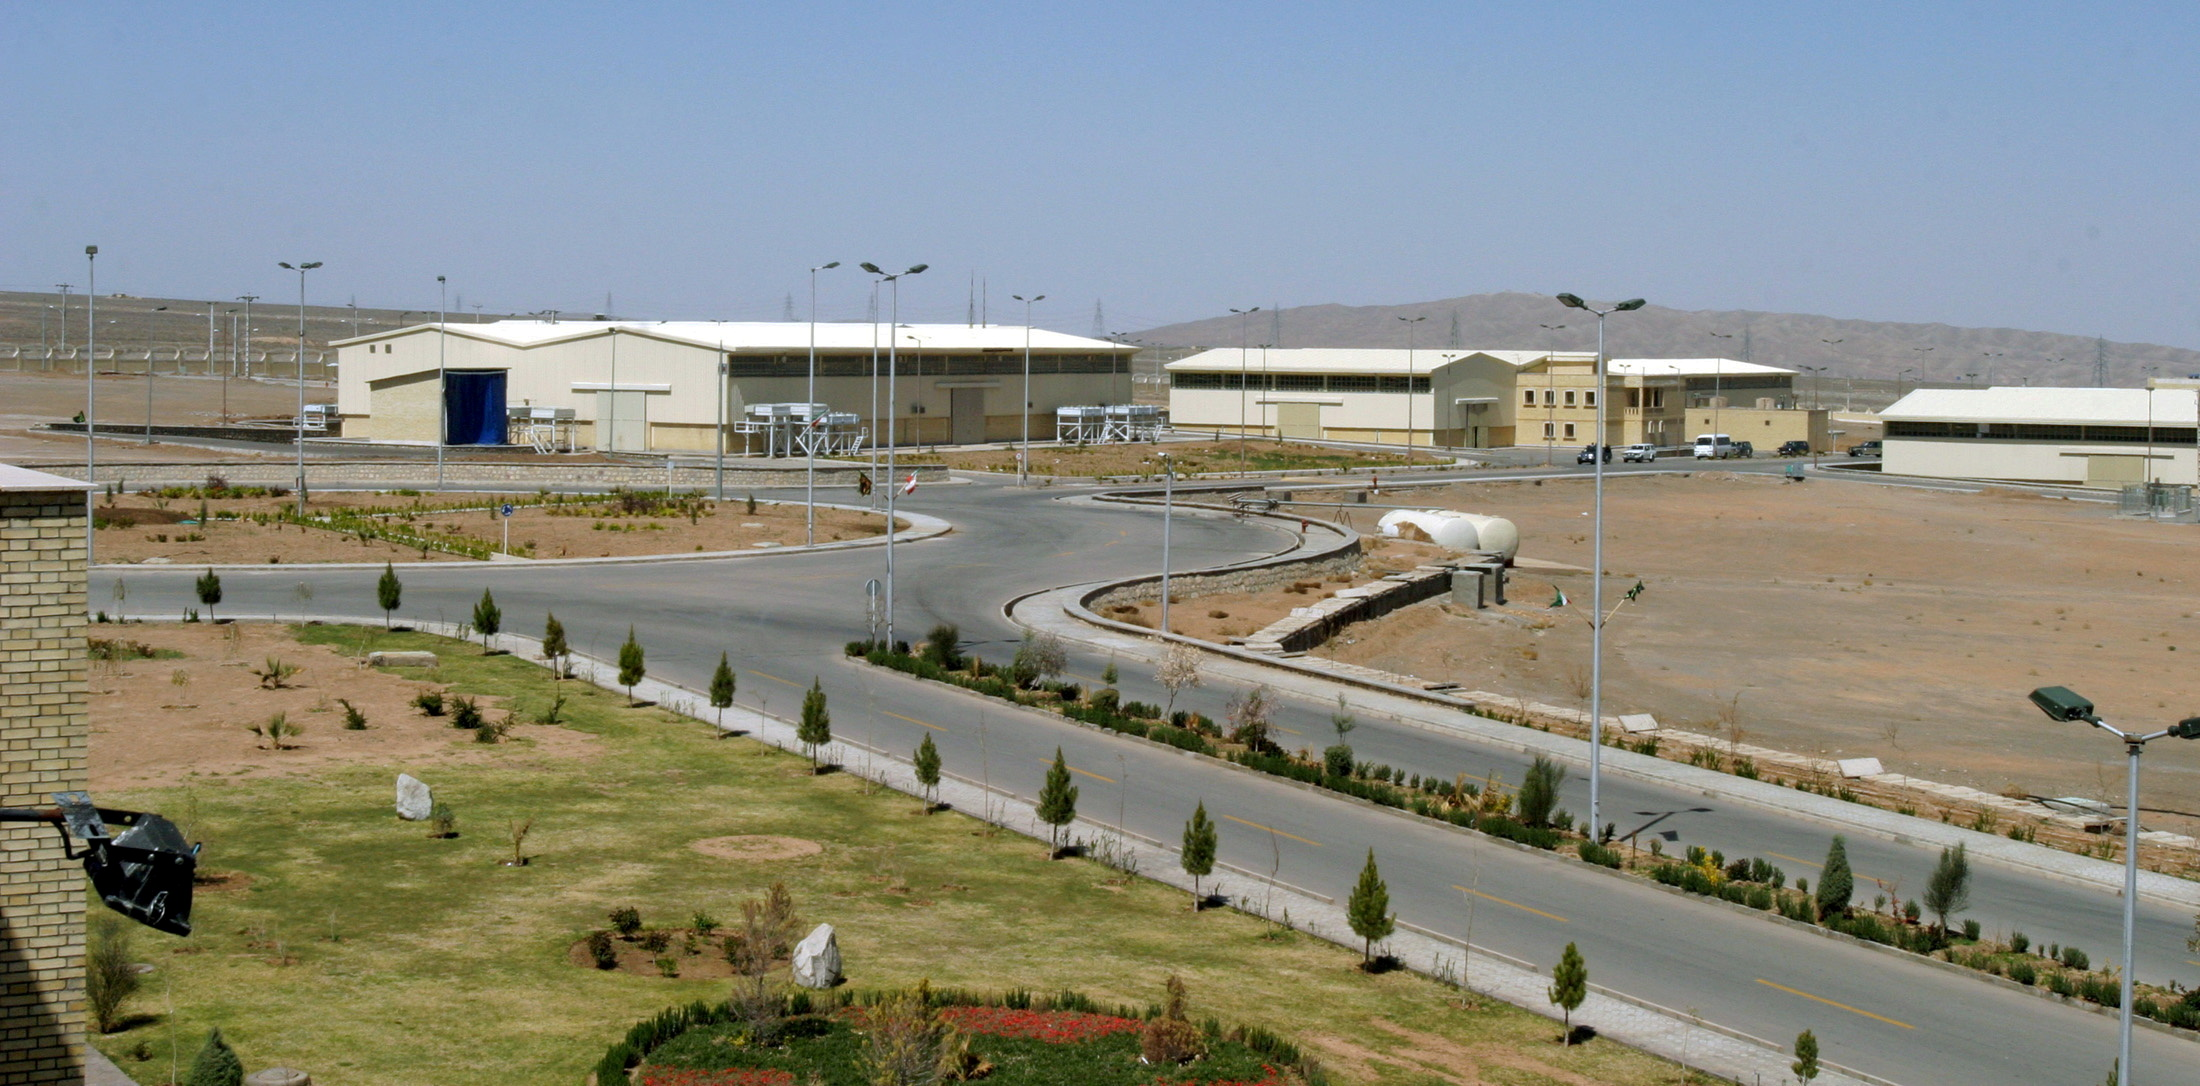 A view of the Natanz uranium enrichment facility 250 km (155 miles) south of the Iranian capital Tehran, March 30, 2005. REUTERS/Raheb Homavandi//File Photo/File Photo